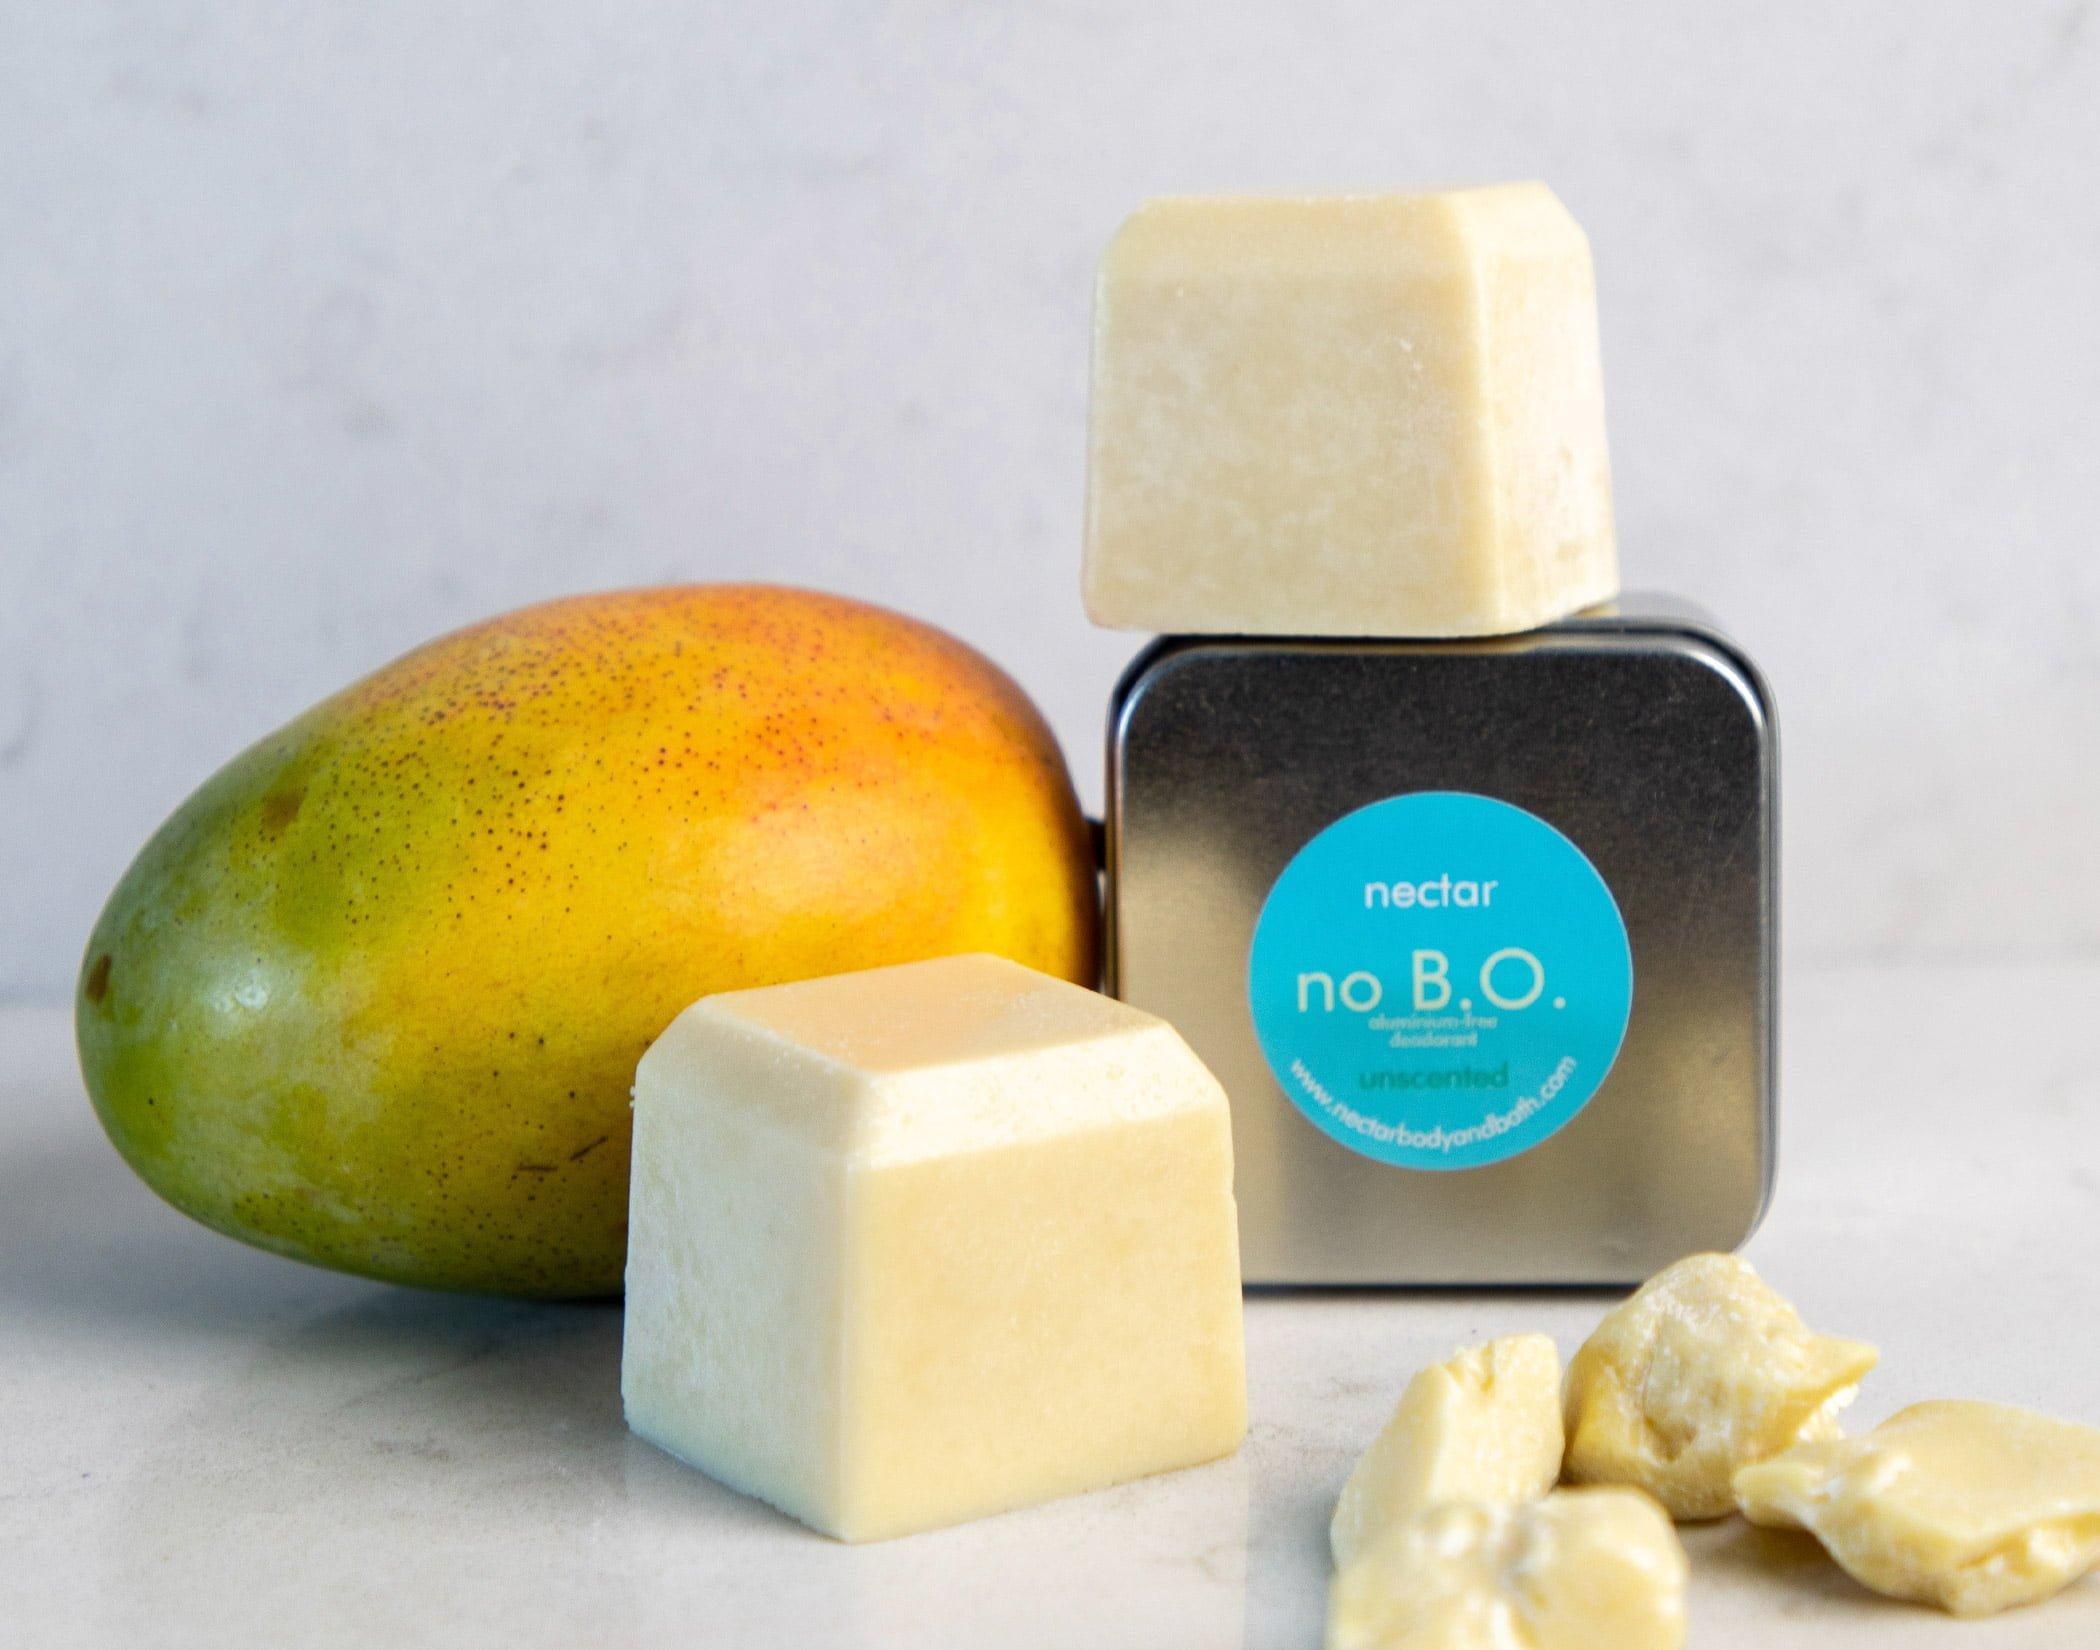 natural-deoderant-no-bo-unscented